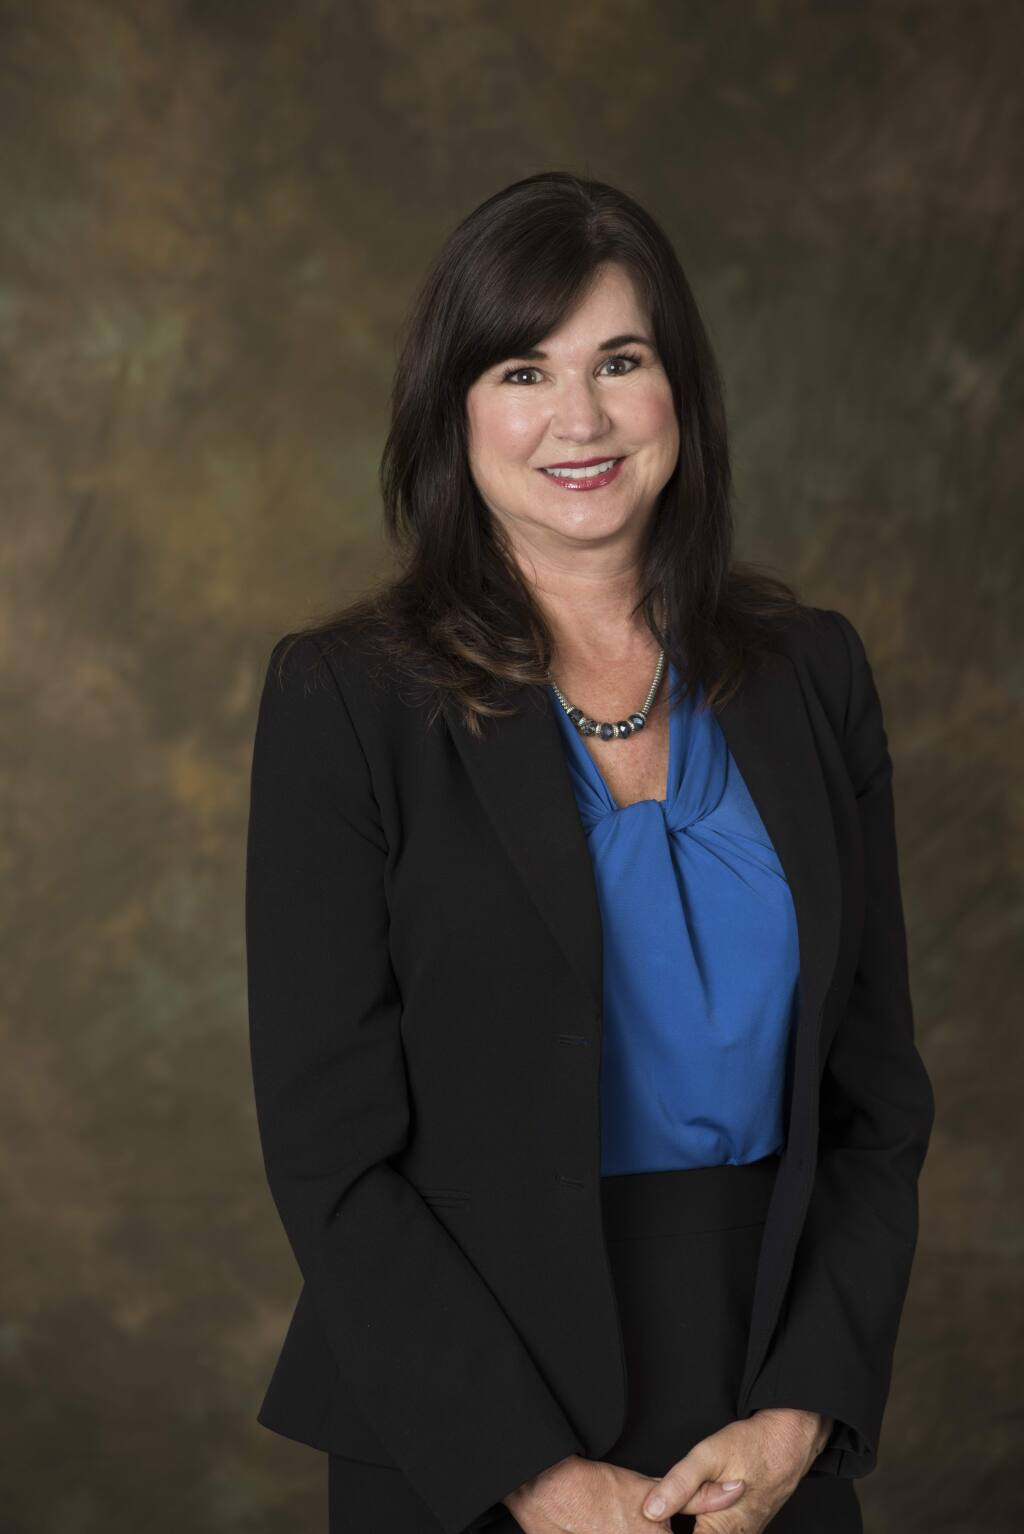 Judy James, director of government affairs, North Bay region, Comcast (TIMM EUBANKS)